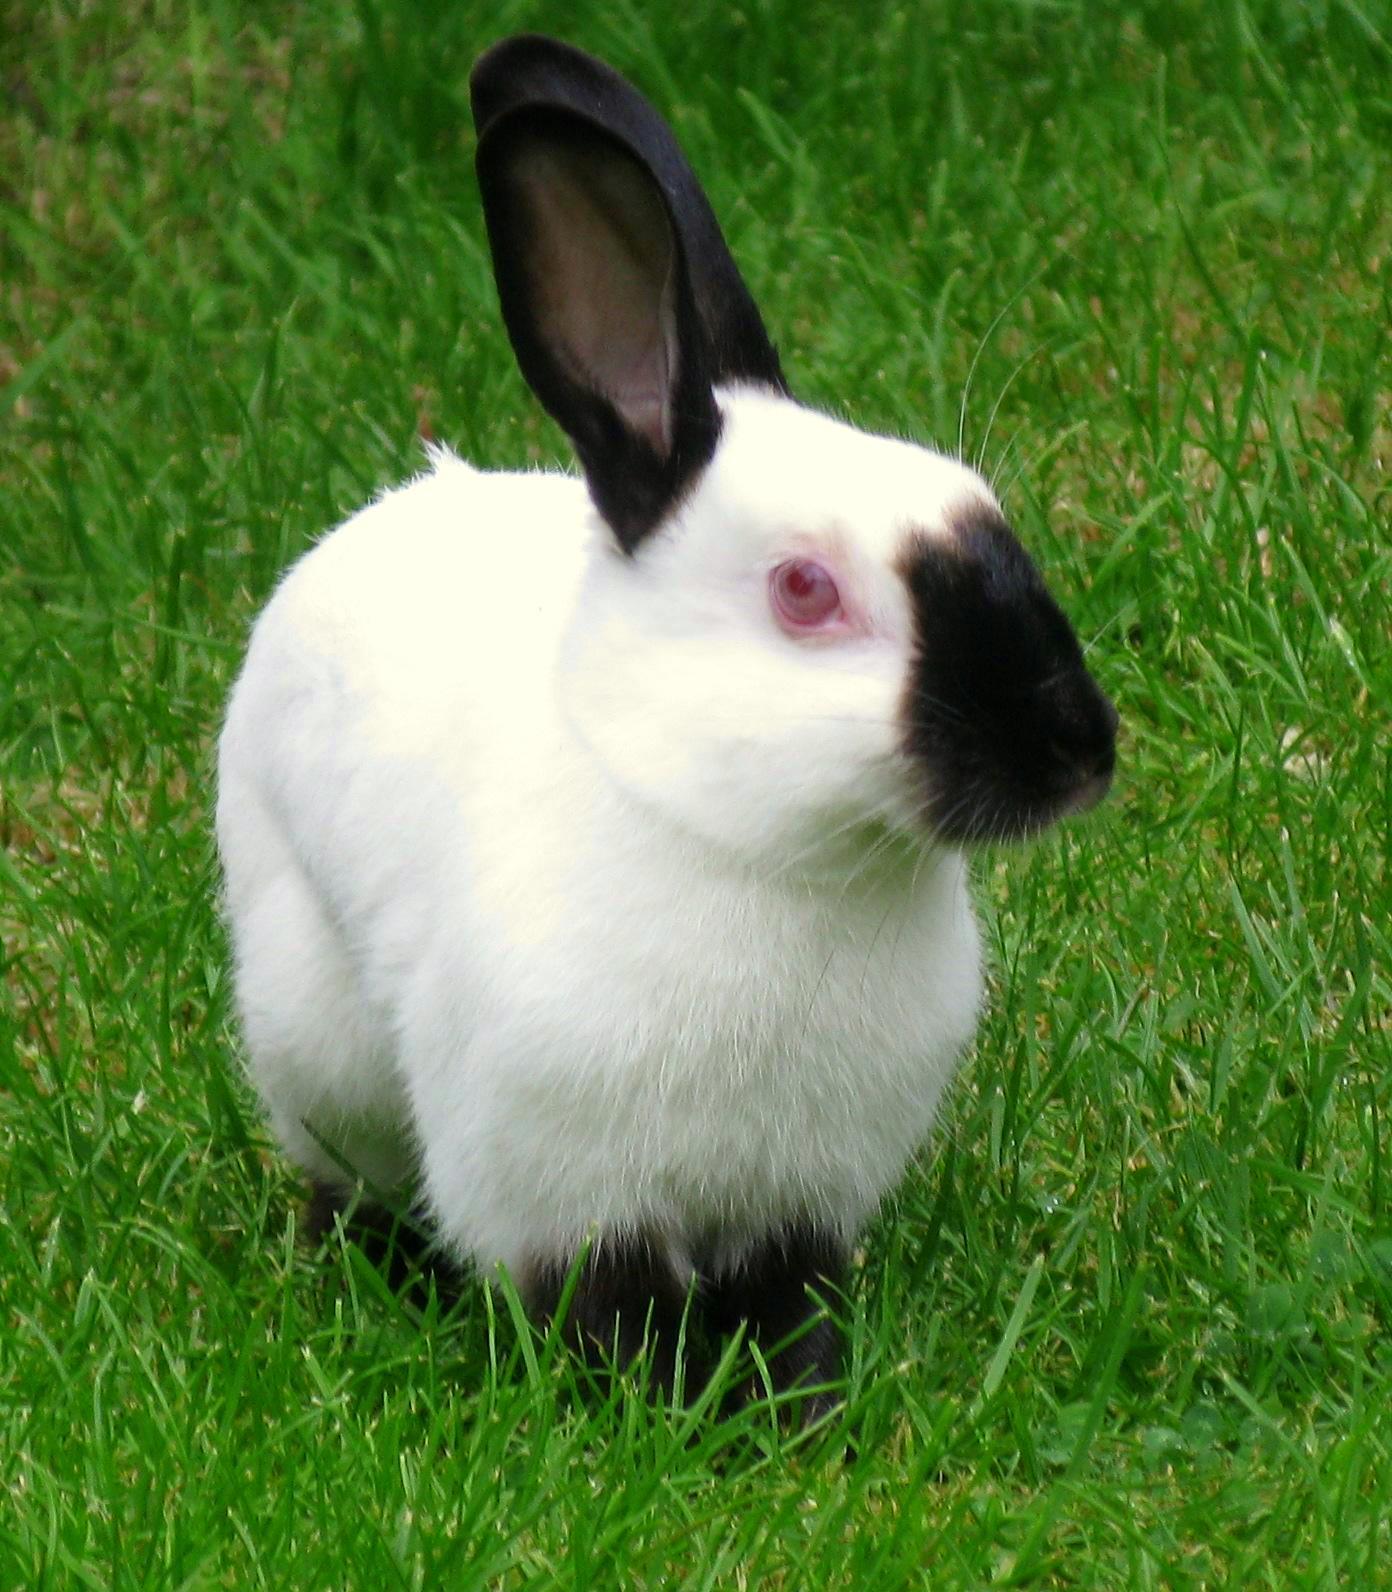 PETS: Type Of Bunny Rabbit